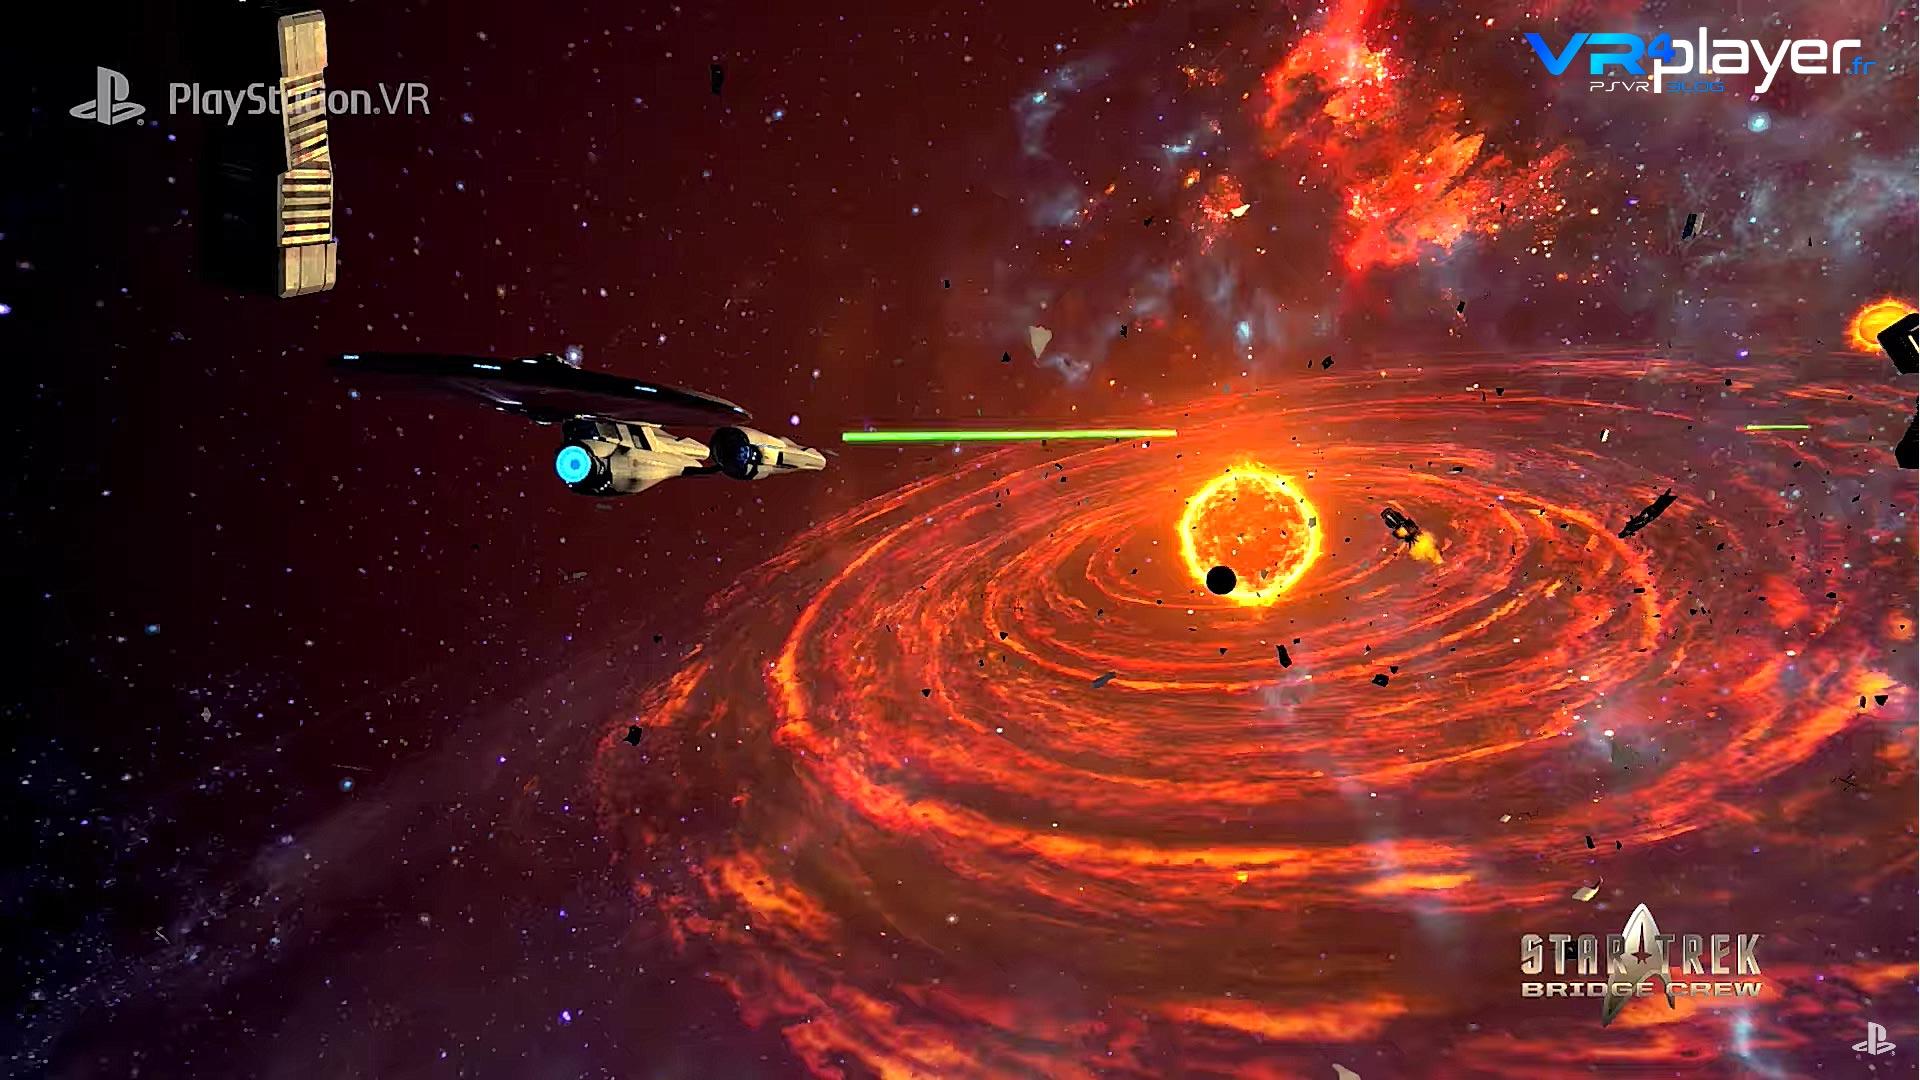 Star Trek Bridge Crew PSVR - VR4Player